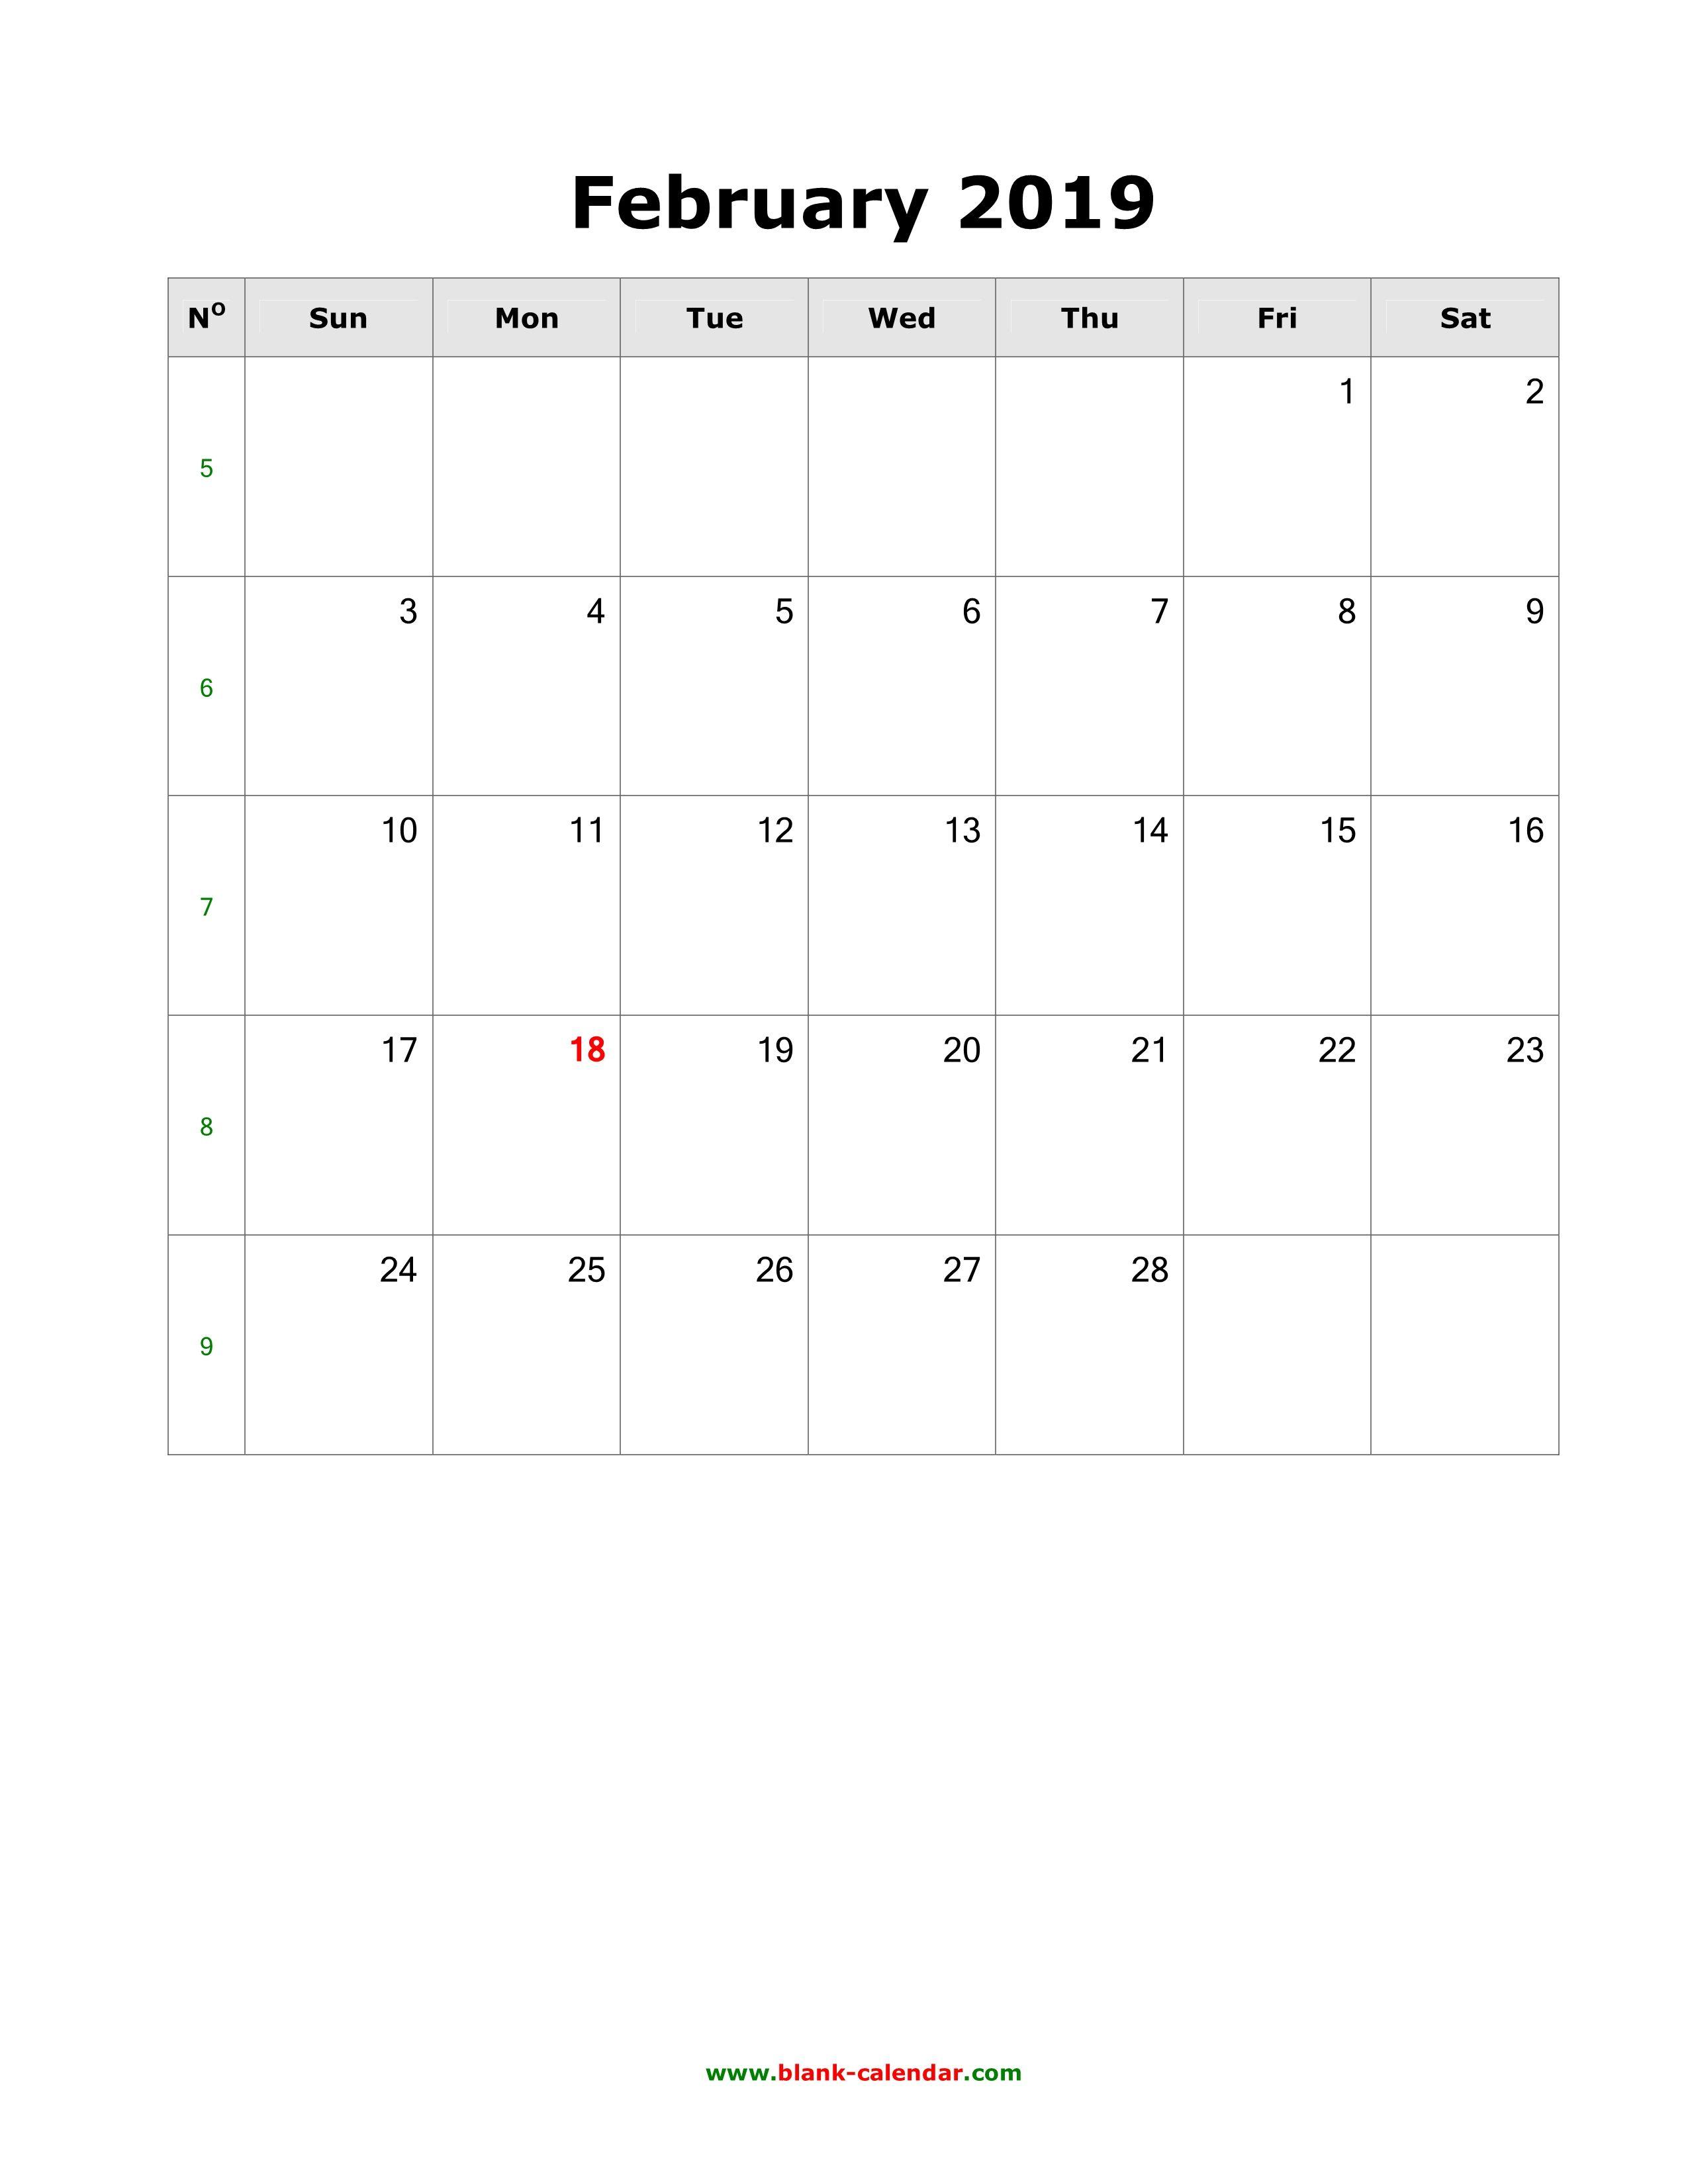 List Calendar For February 2019 February 2019 February Calendar 2019 To Do List | Free February 2019 Calendar